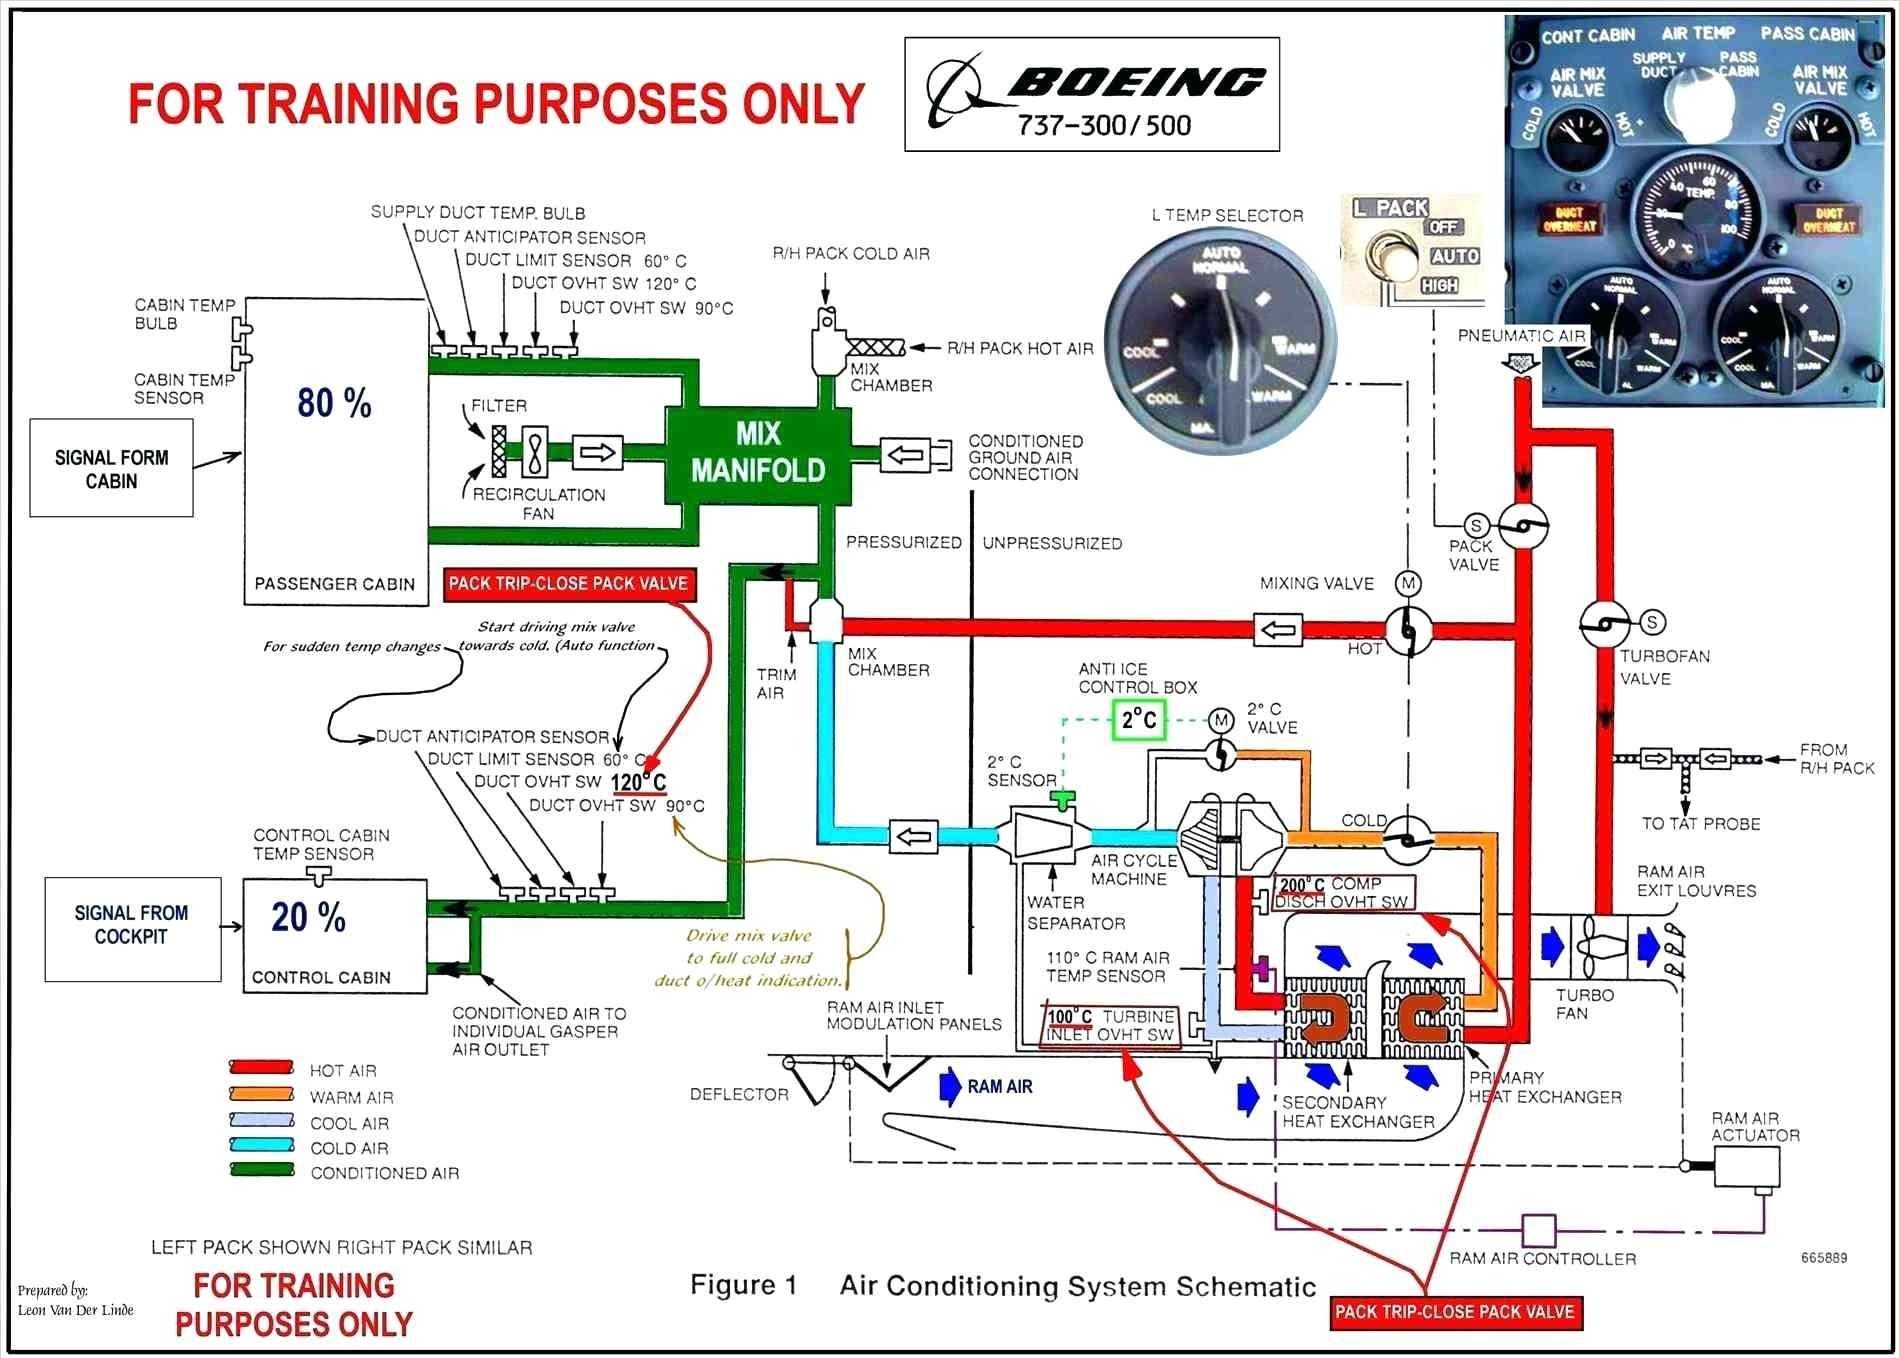 Car Air Conditioning Diagram Car Diagram Car Diagram Wiring for Auto Air Conditioning New Pdf Of Car Air Conditioning Diagram